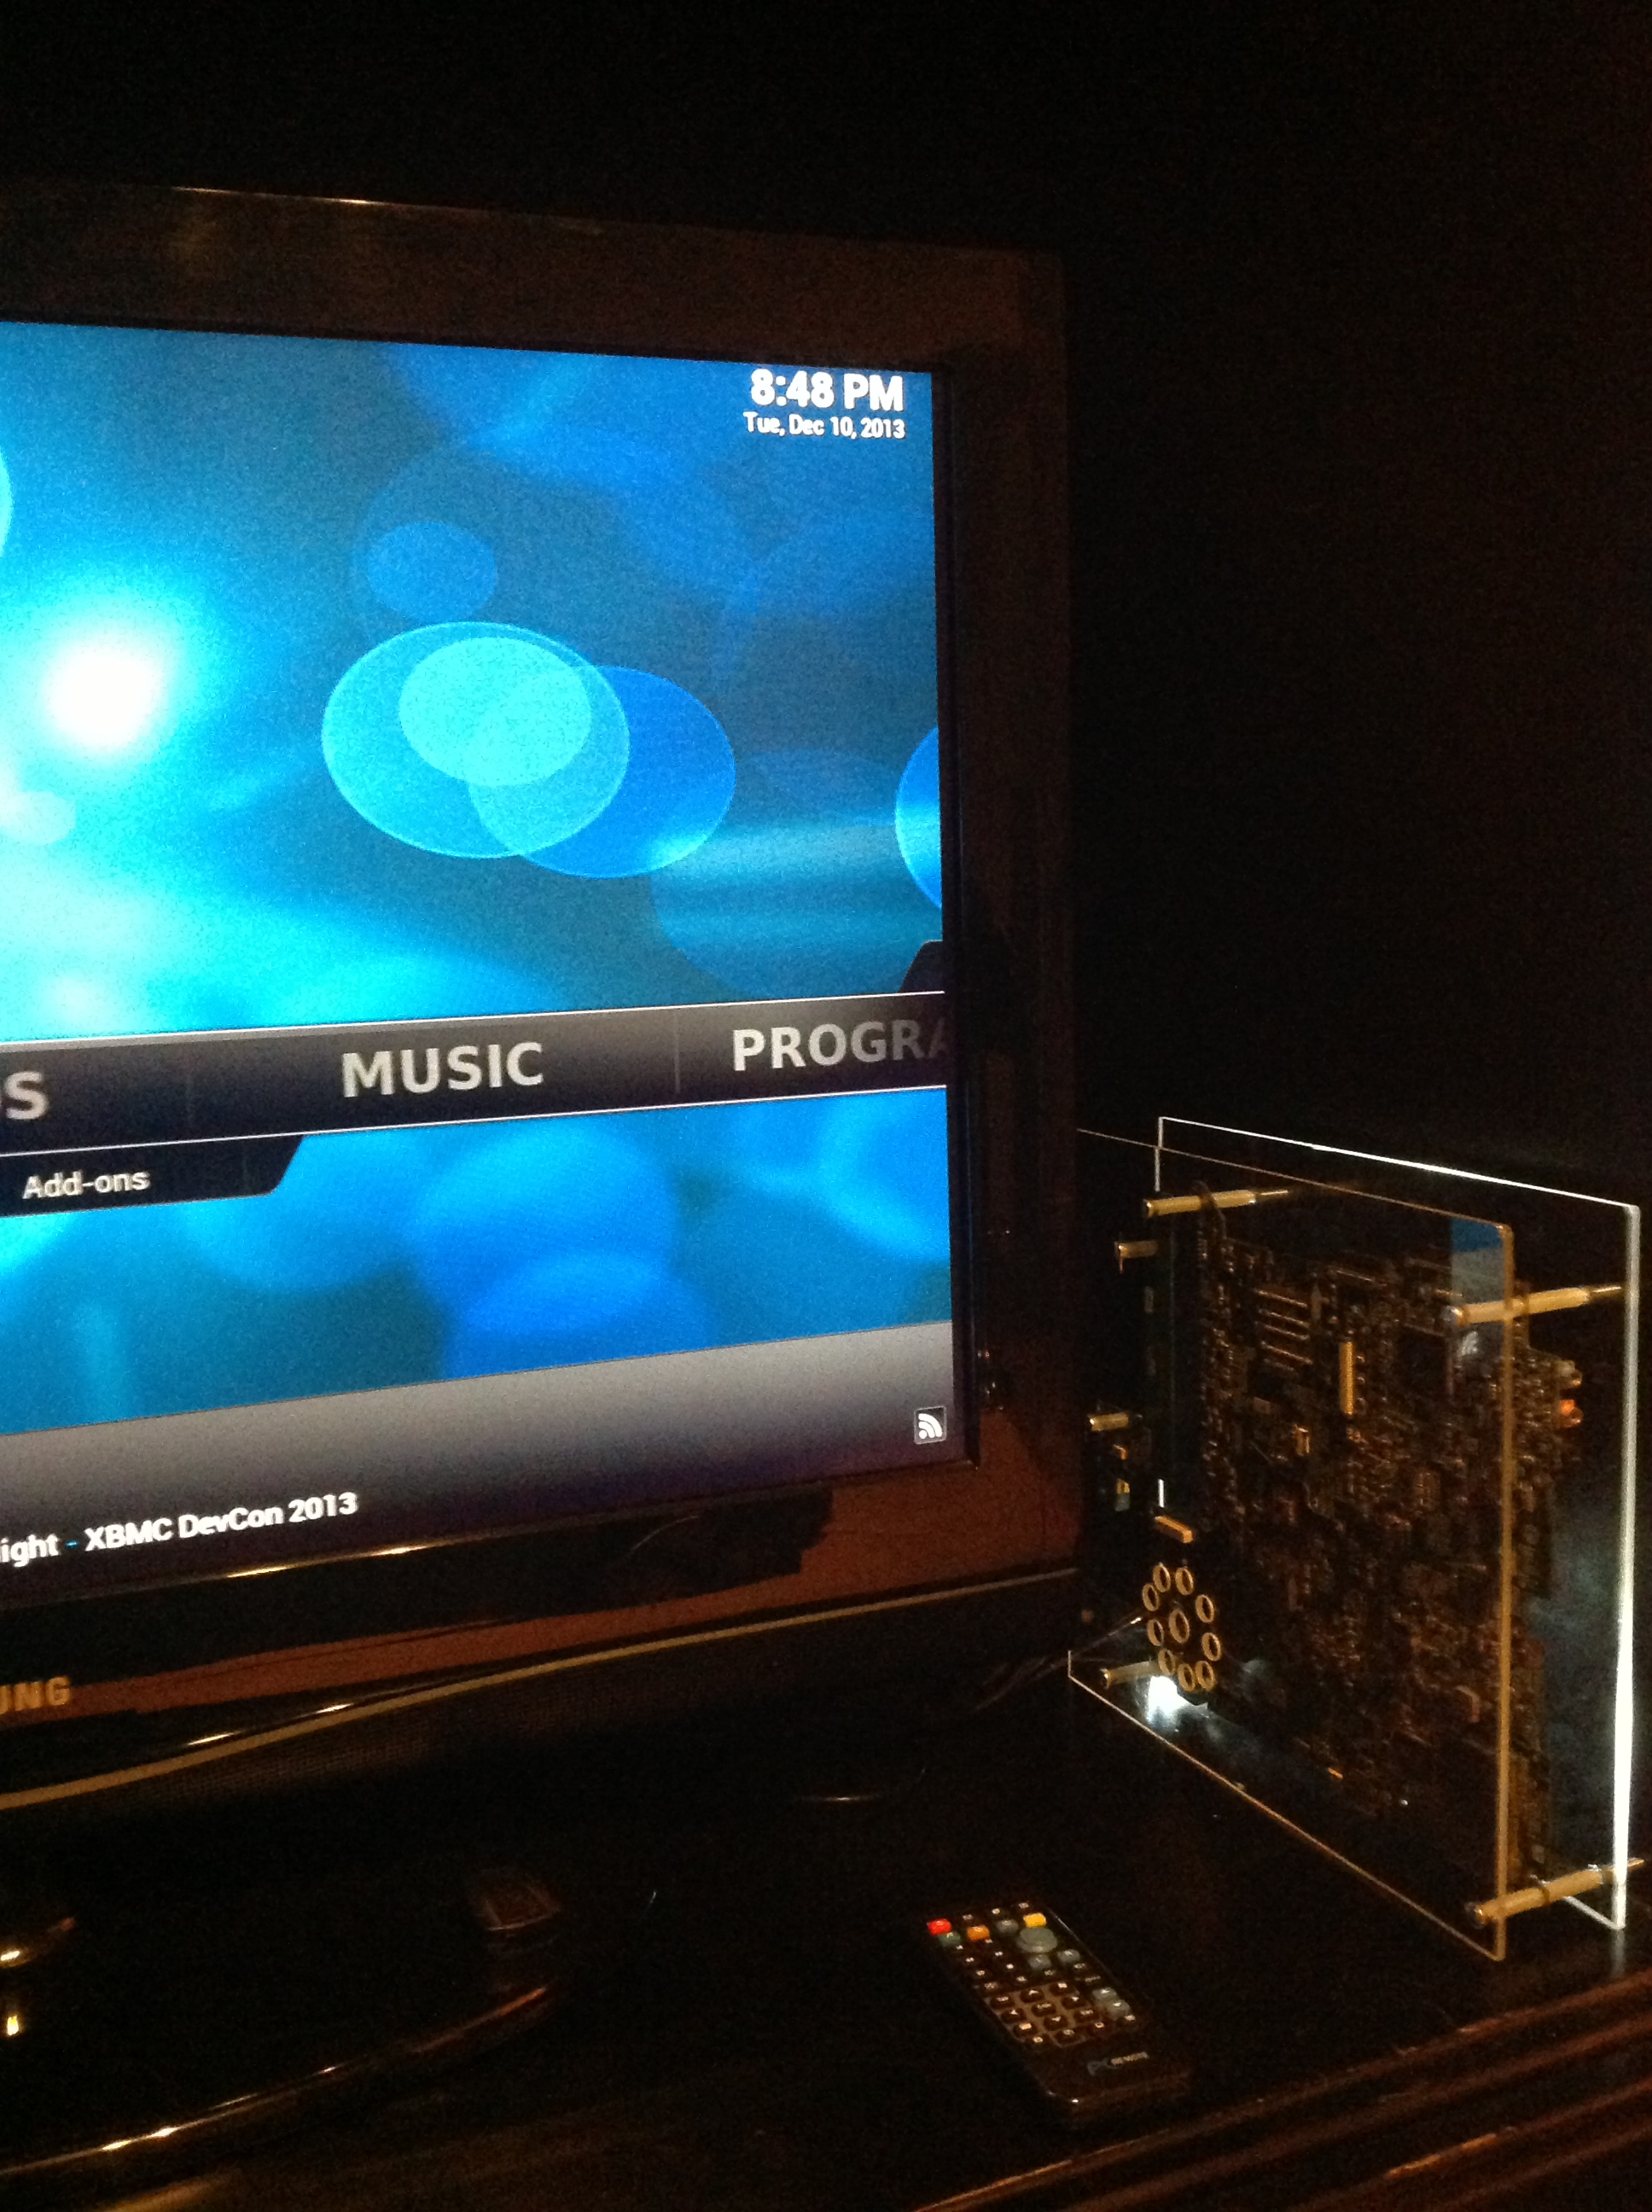 Convert an old laptop into a Media Center